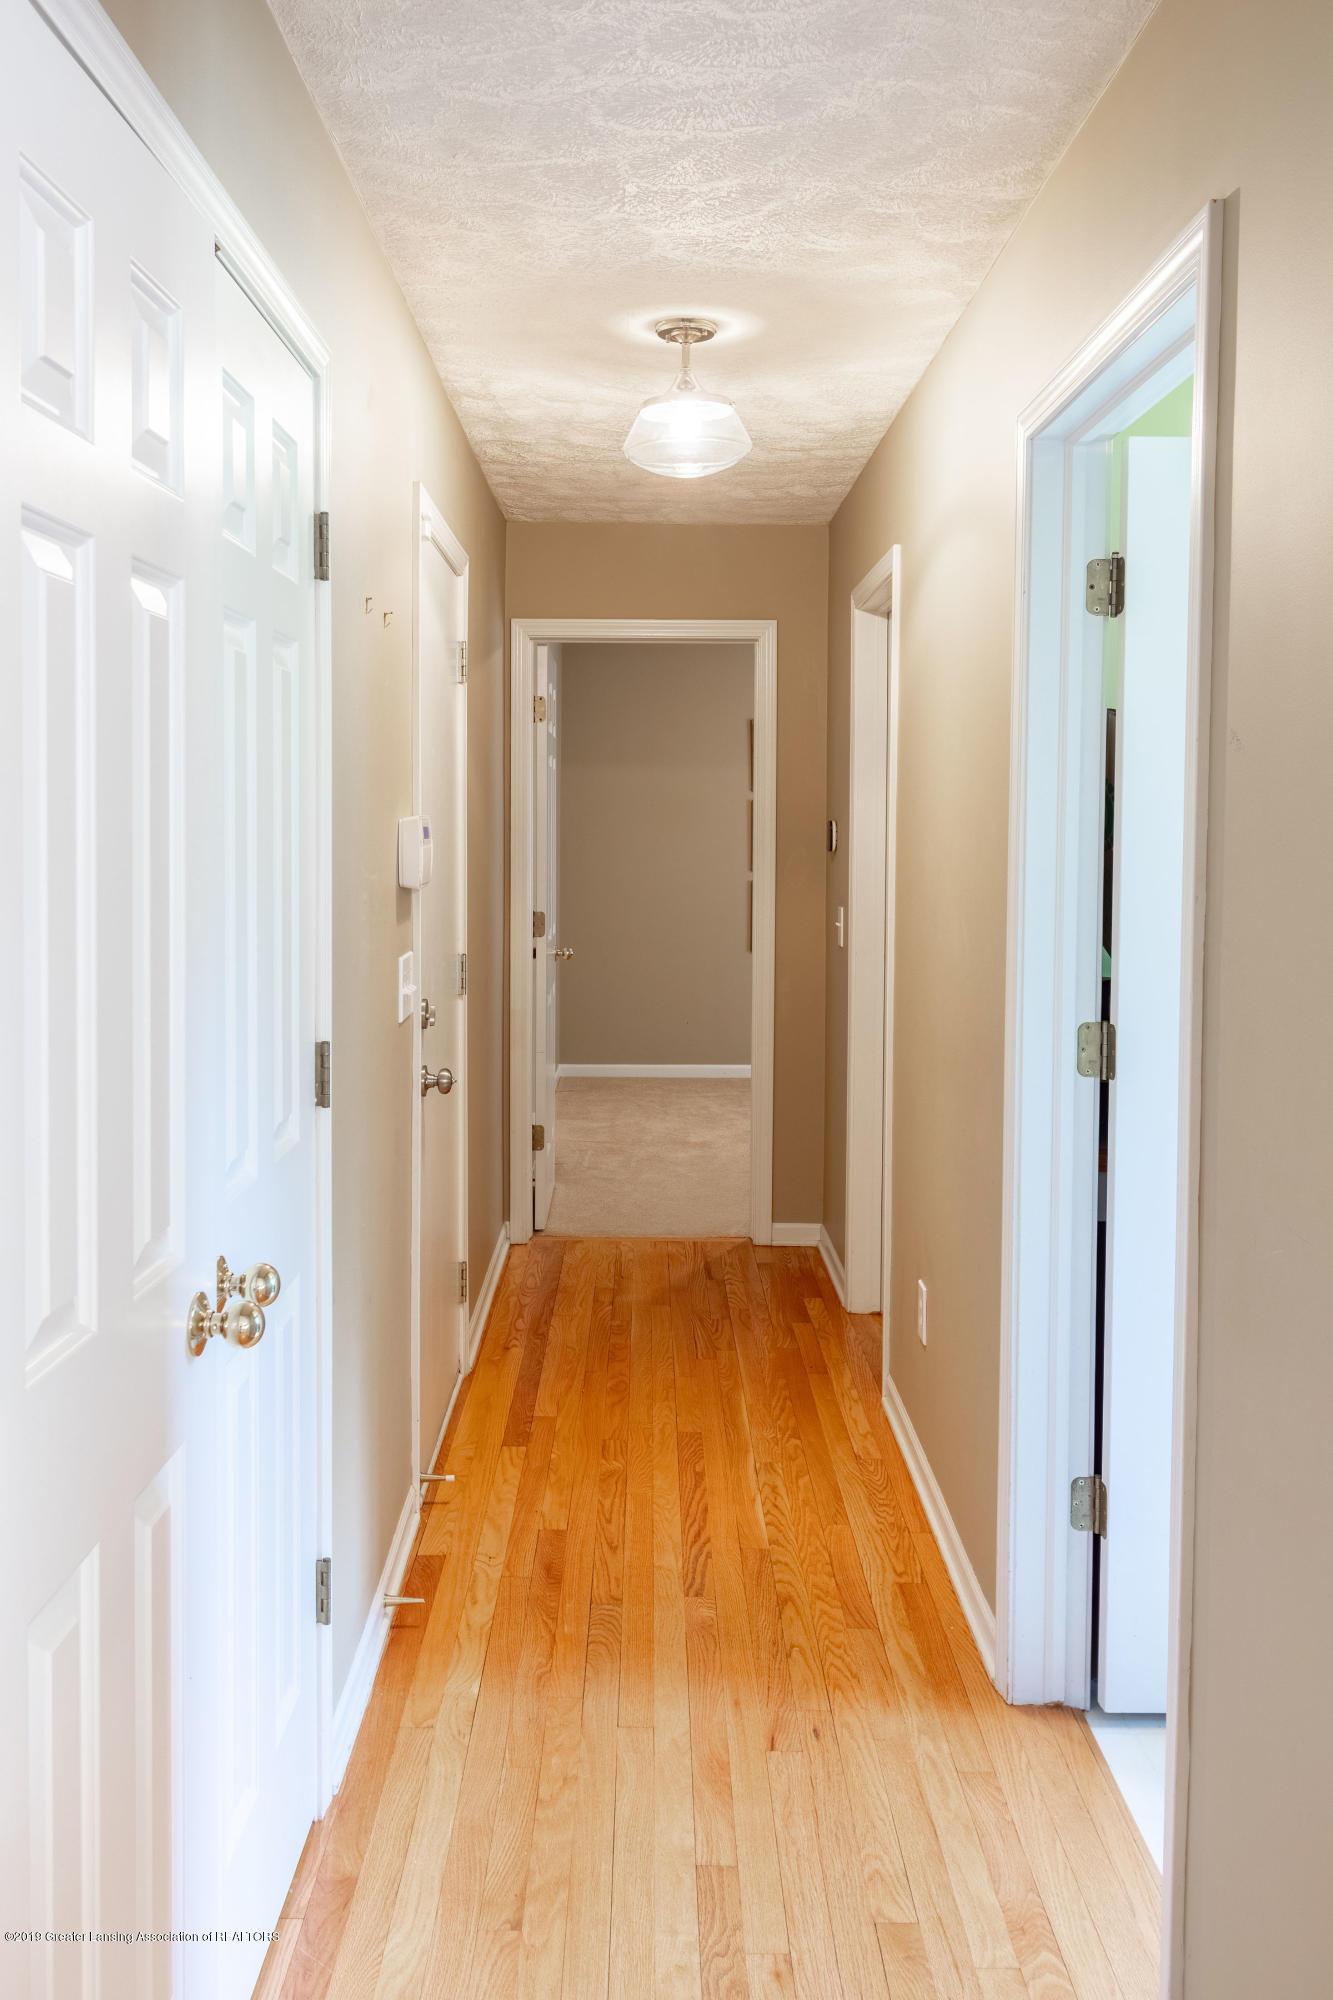 3065 Summergate Ln - Hallway to Office - 27